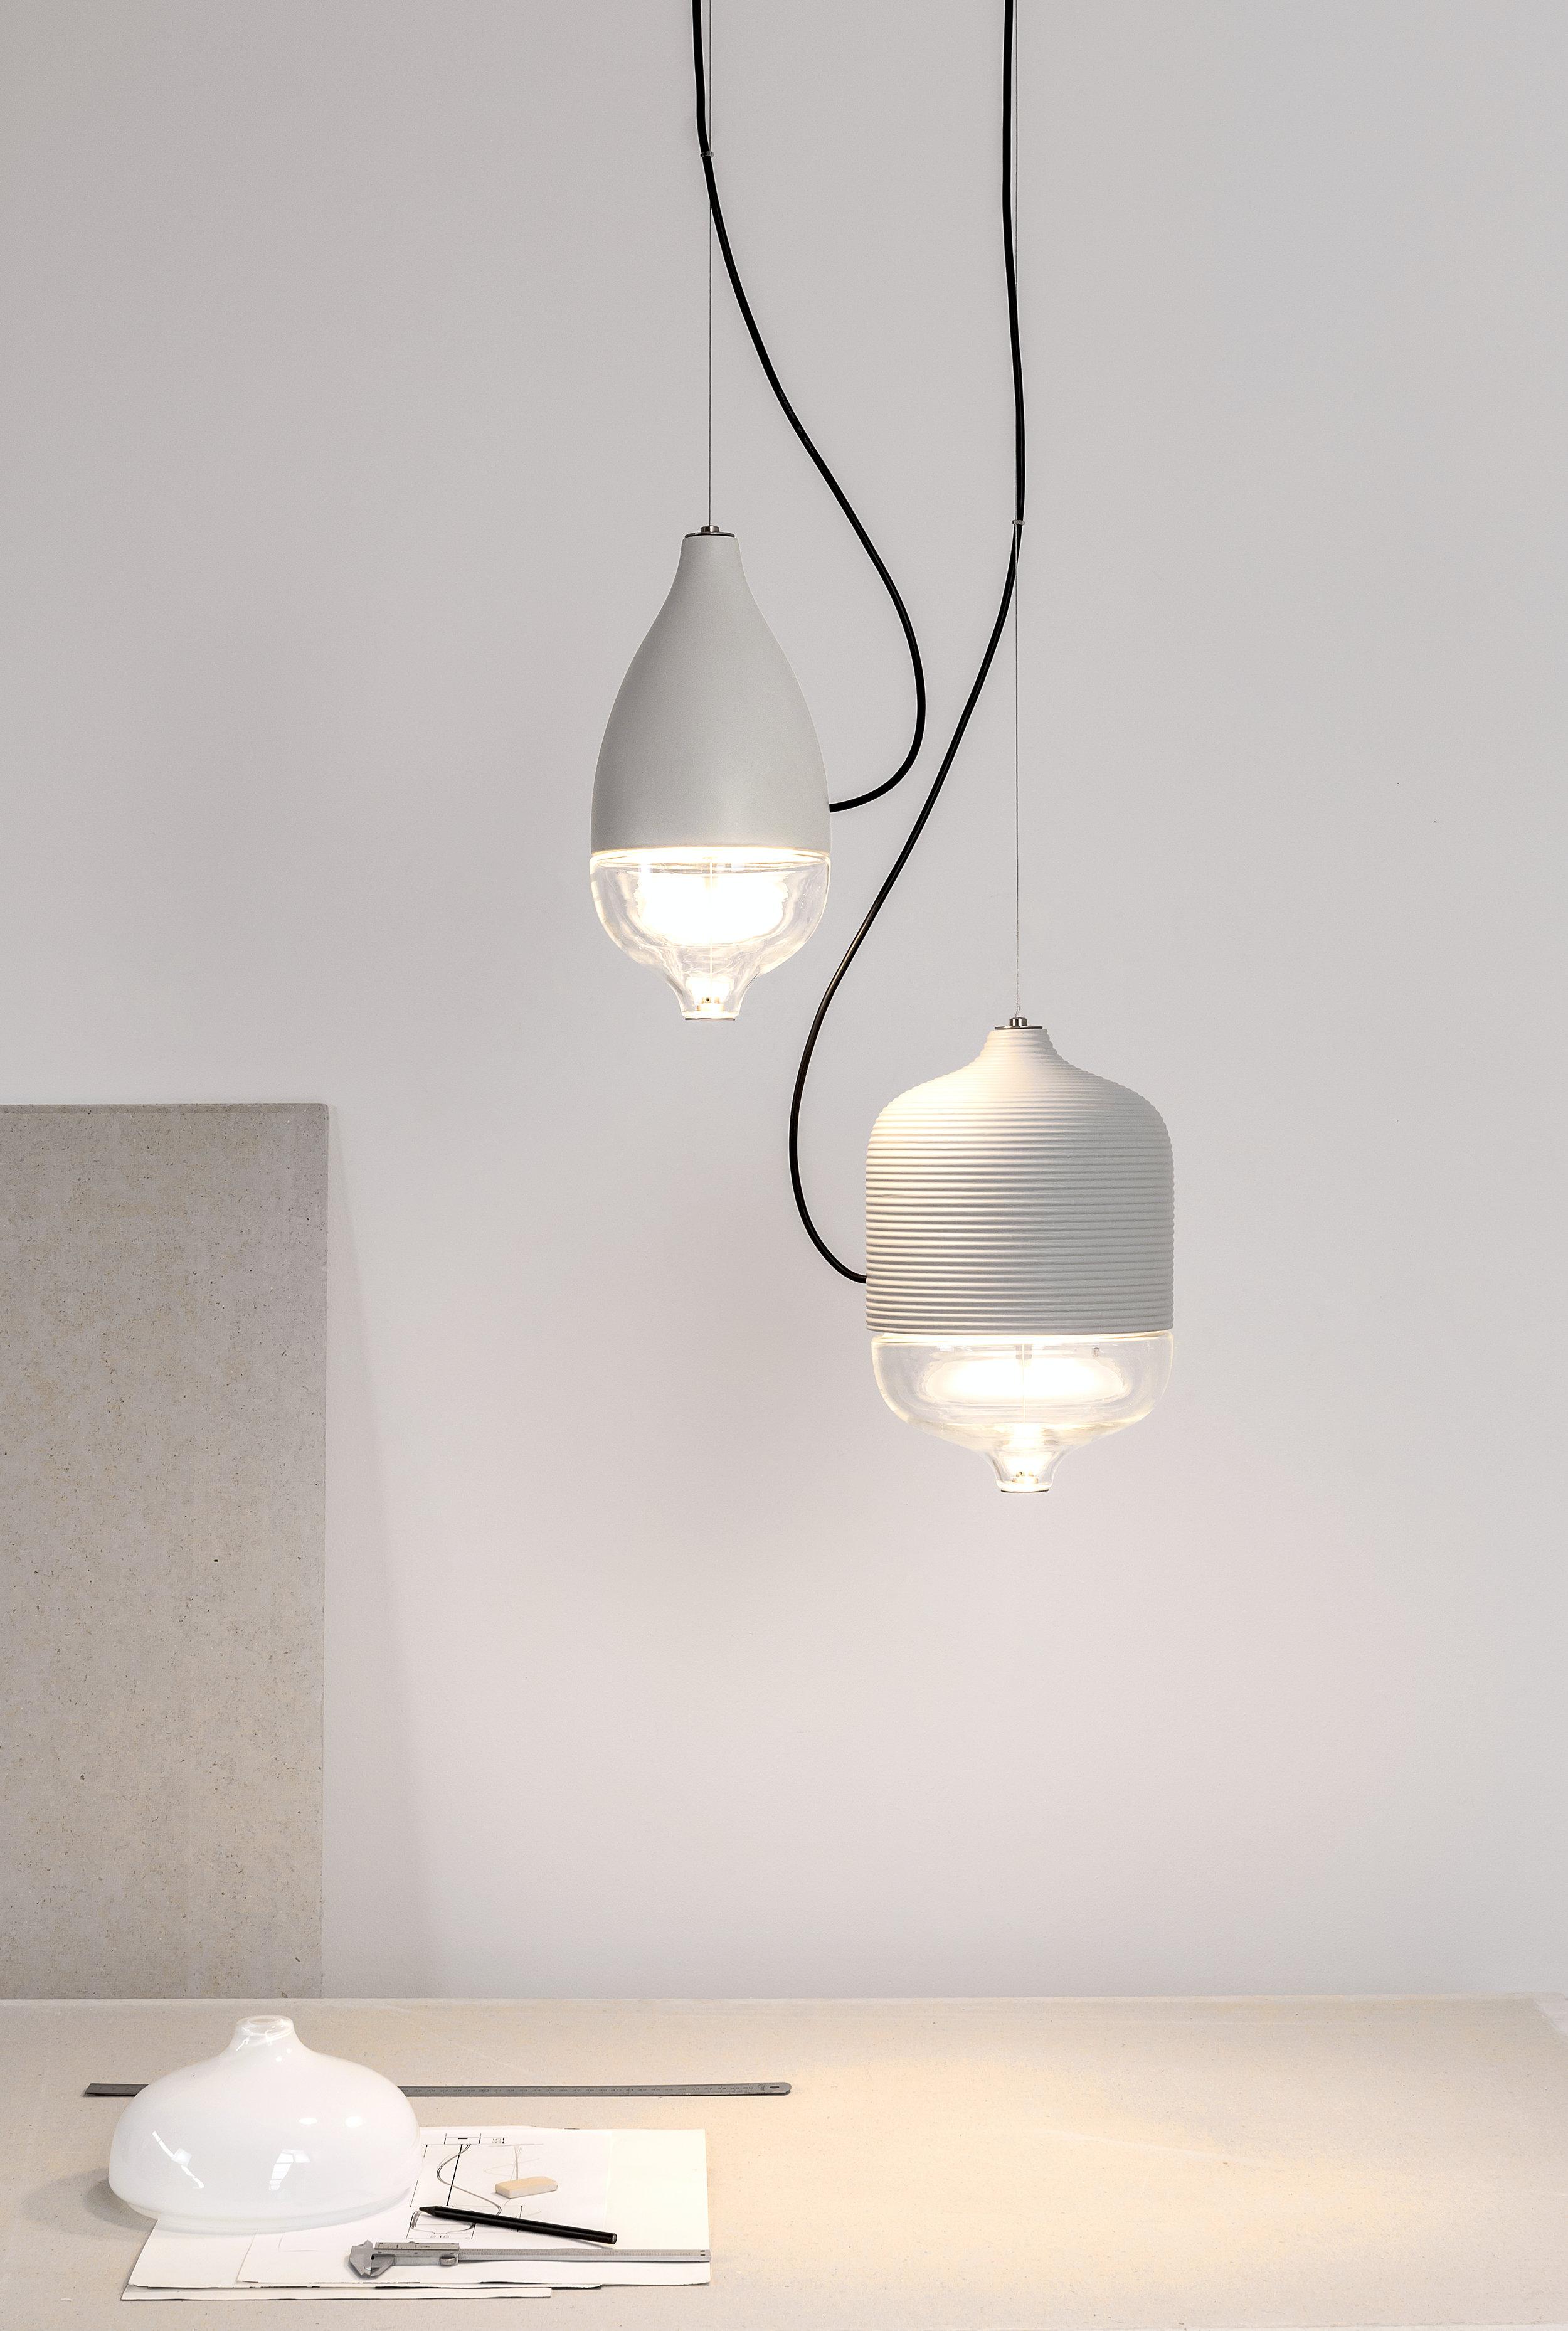 T-Cotta  pendant in situ ⓒ Hind Rabii Design by Chiaramonte Marin Studio, 2018